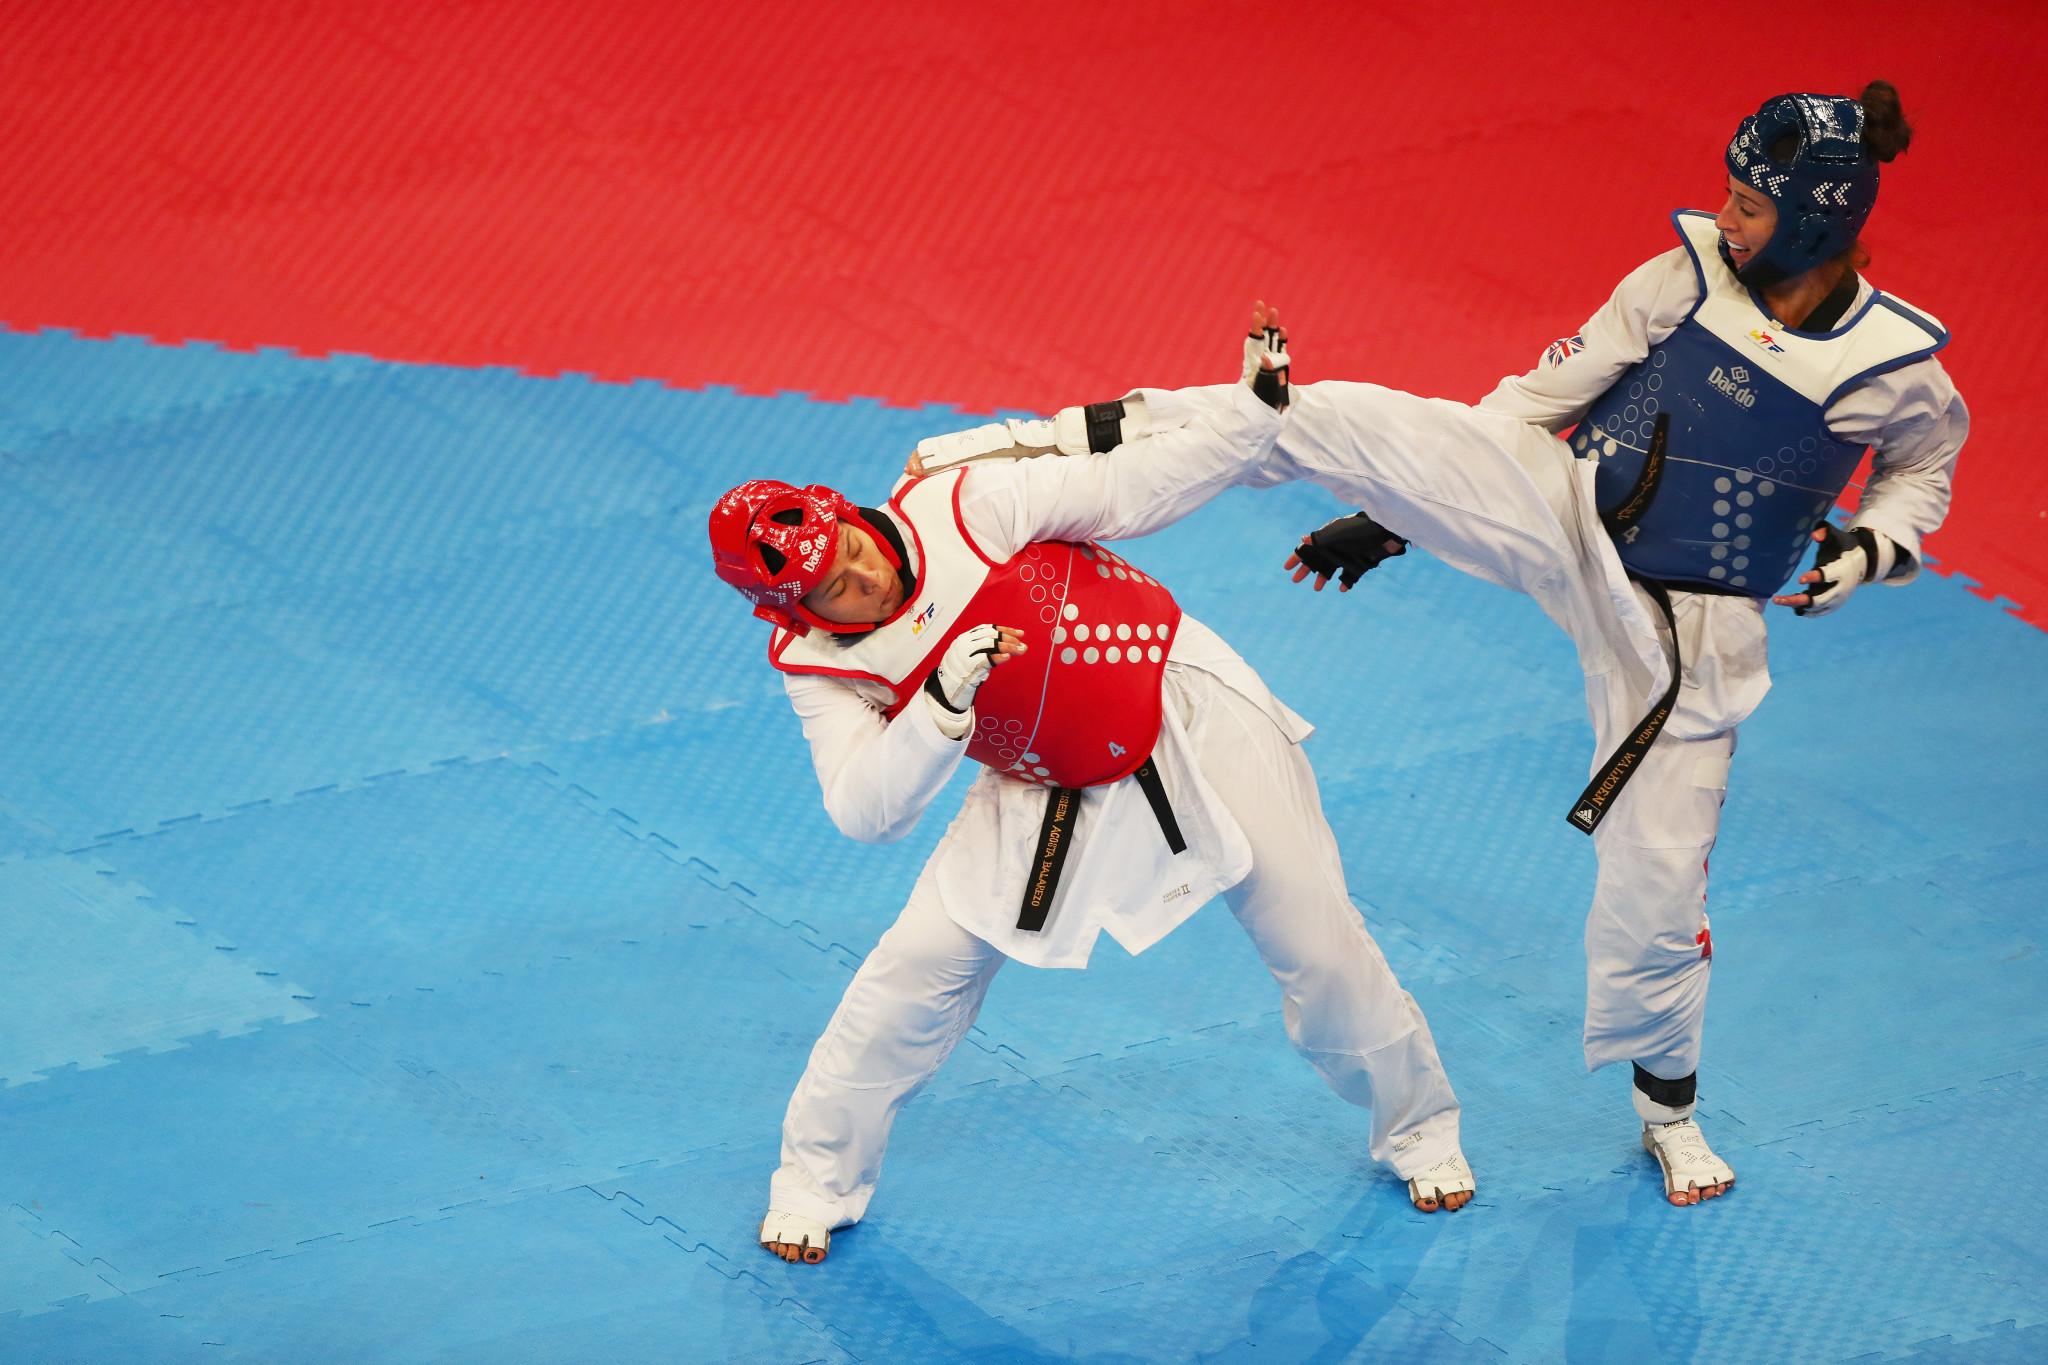 Walkden among stars competing at World Taekwondo Taoyuan Grand Prix